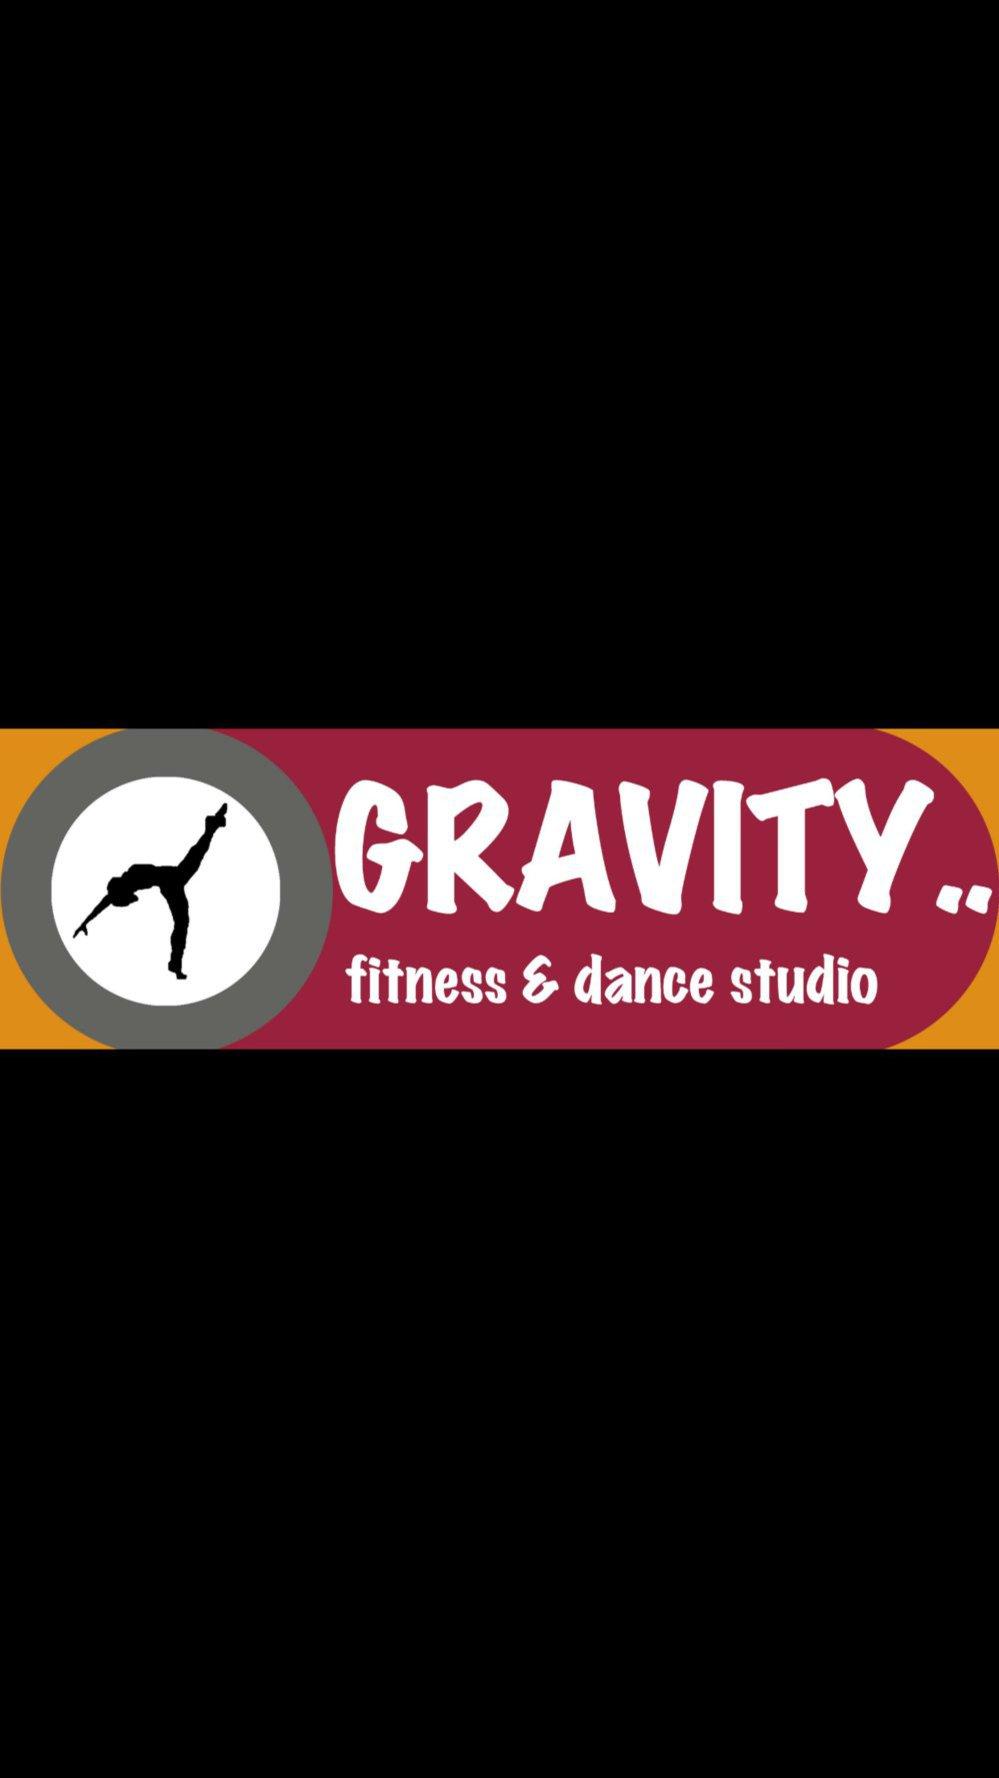 Gravity Fitness & Dance Studio  cover